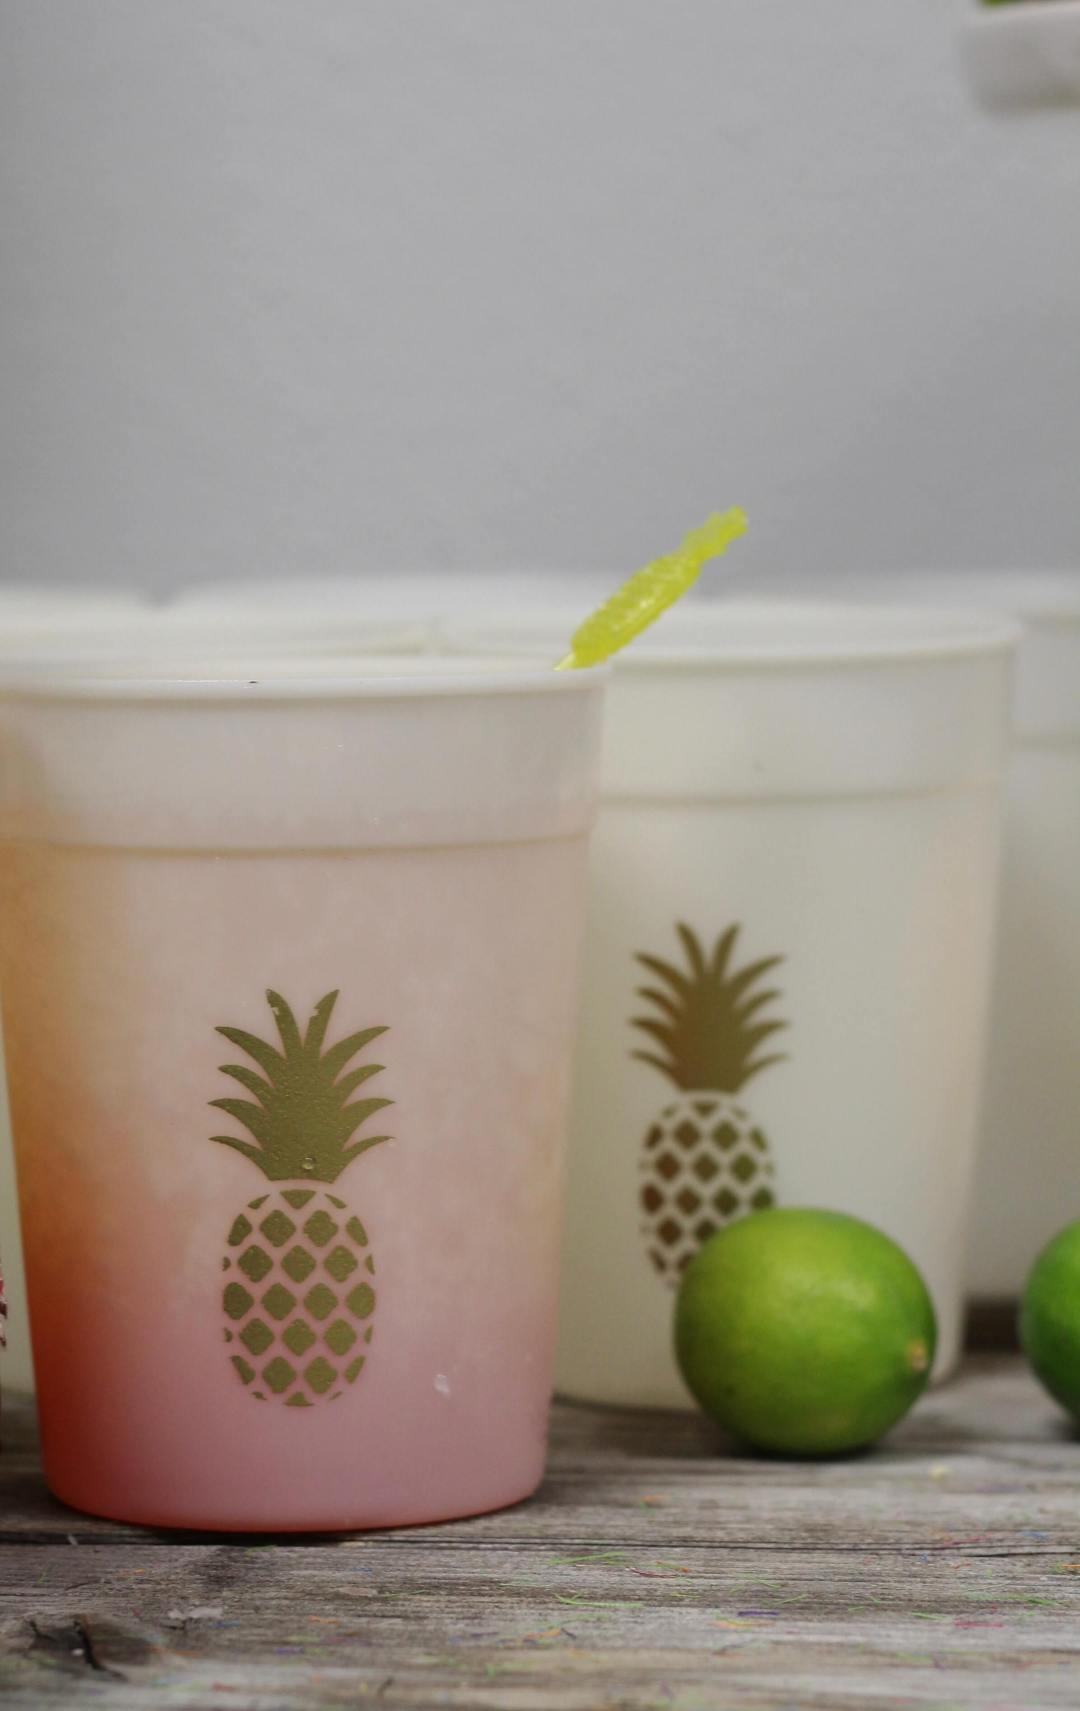 Luau, Oriental Trading Company, Drinks, Margaritaville, Tiki